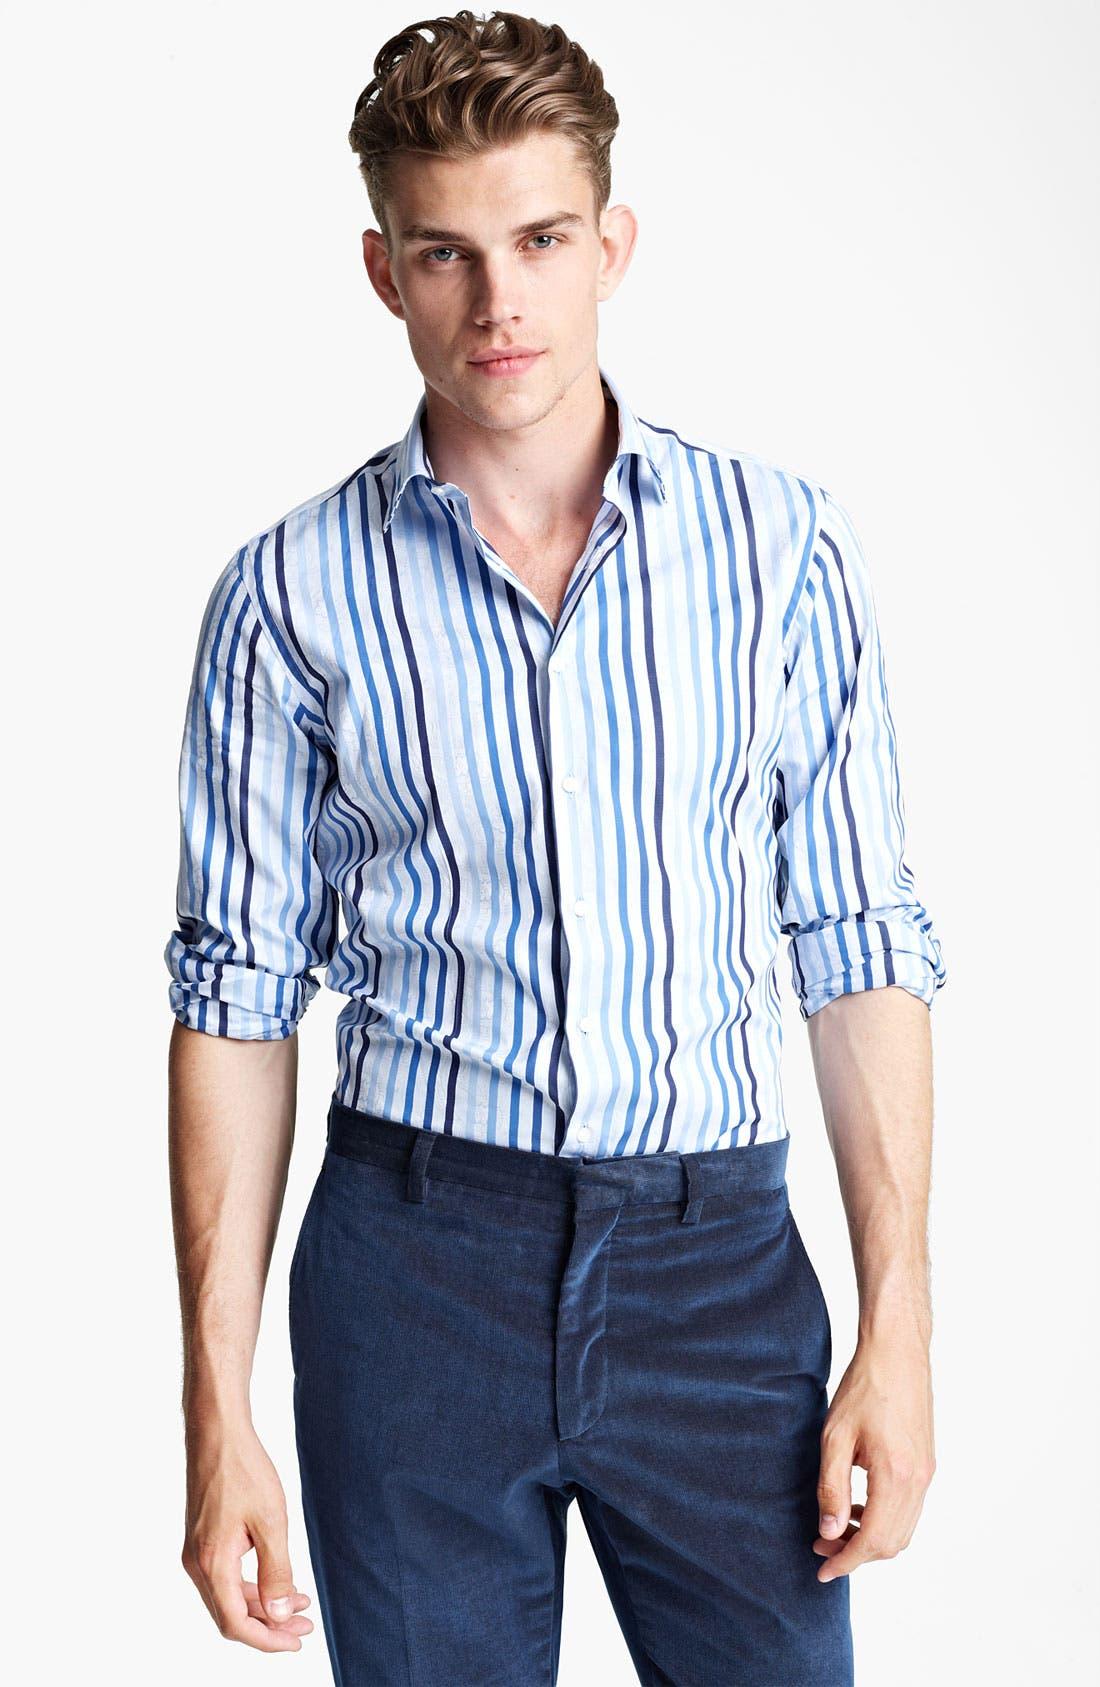 Alternate Image 1 Selected - Etro Stripe Jacquard Print Dress Shirt